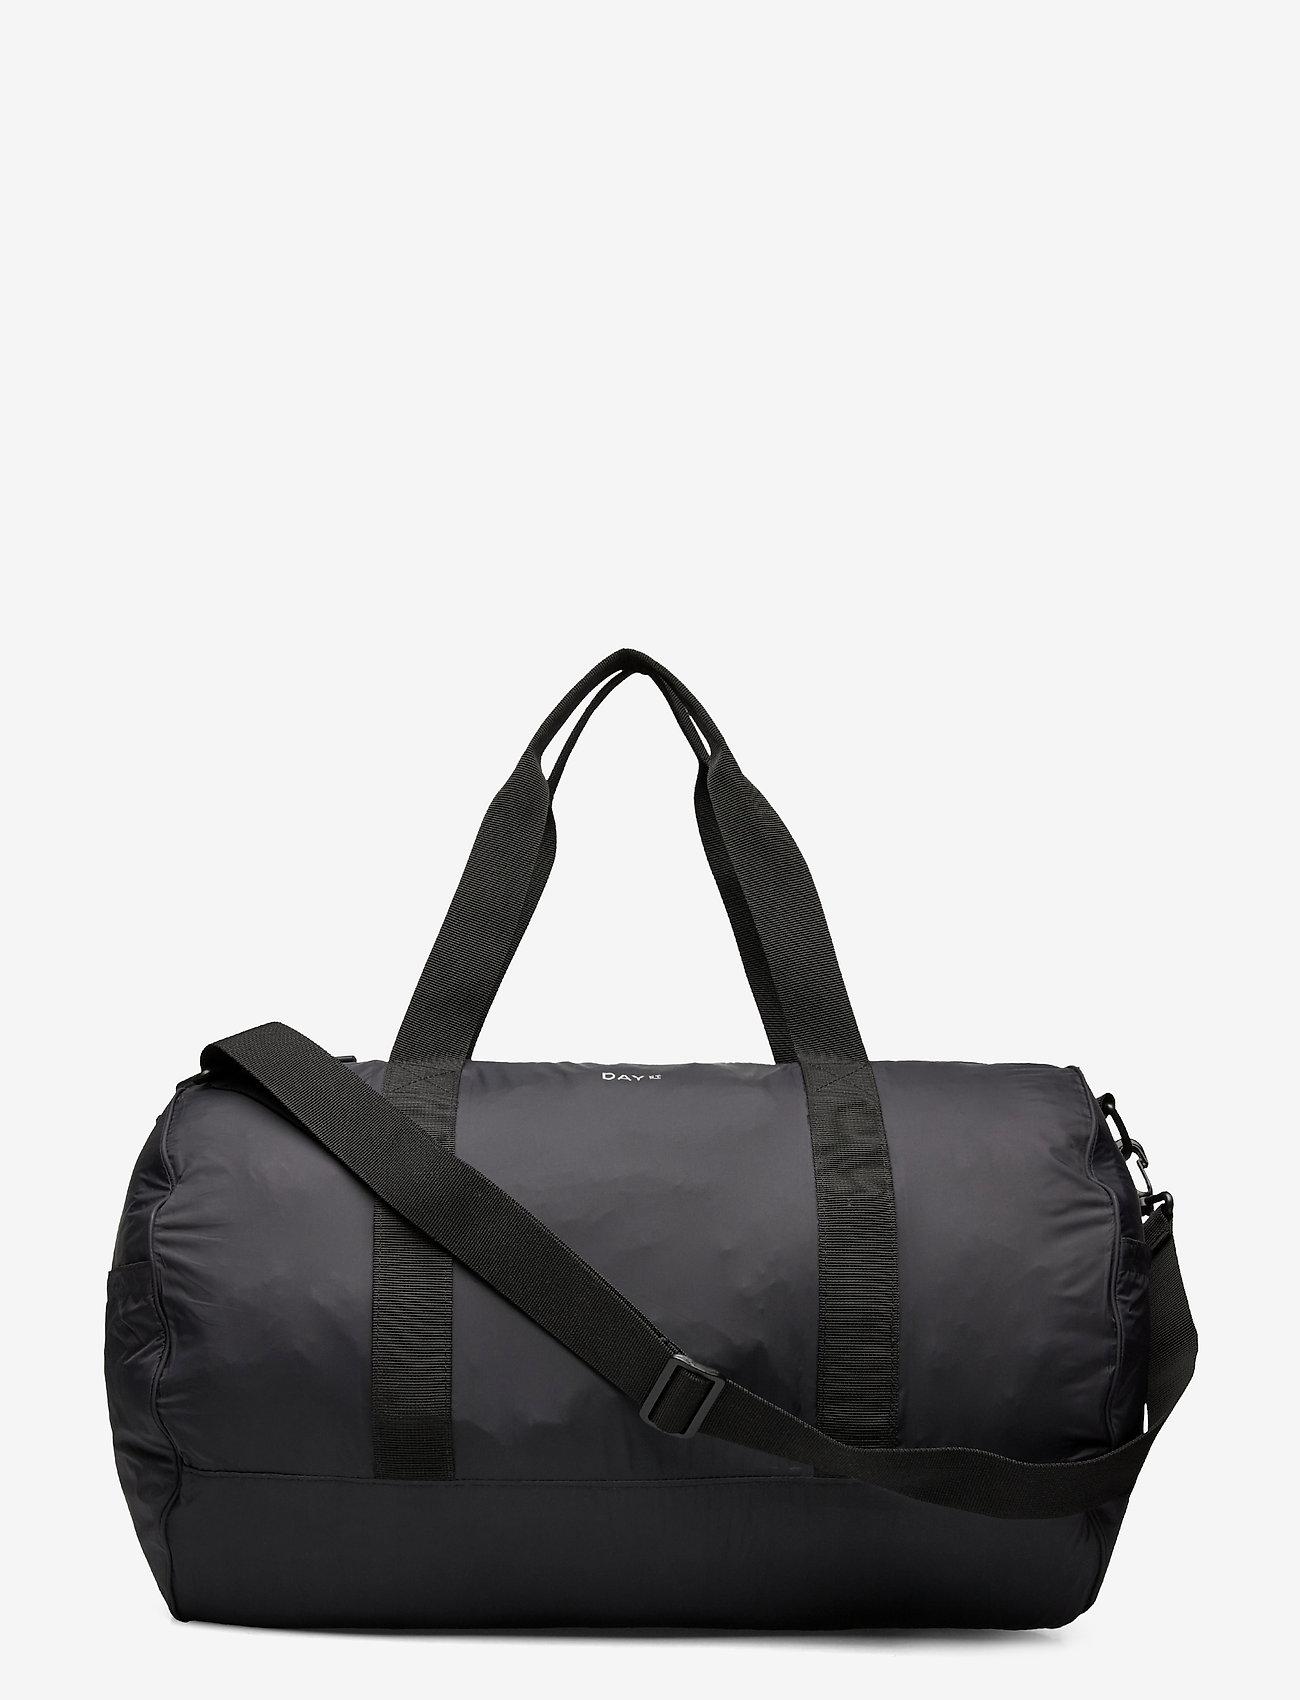 DAY et - Day GW No Rain Sport - weekend bags - black - 0